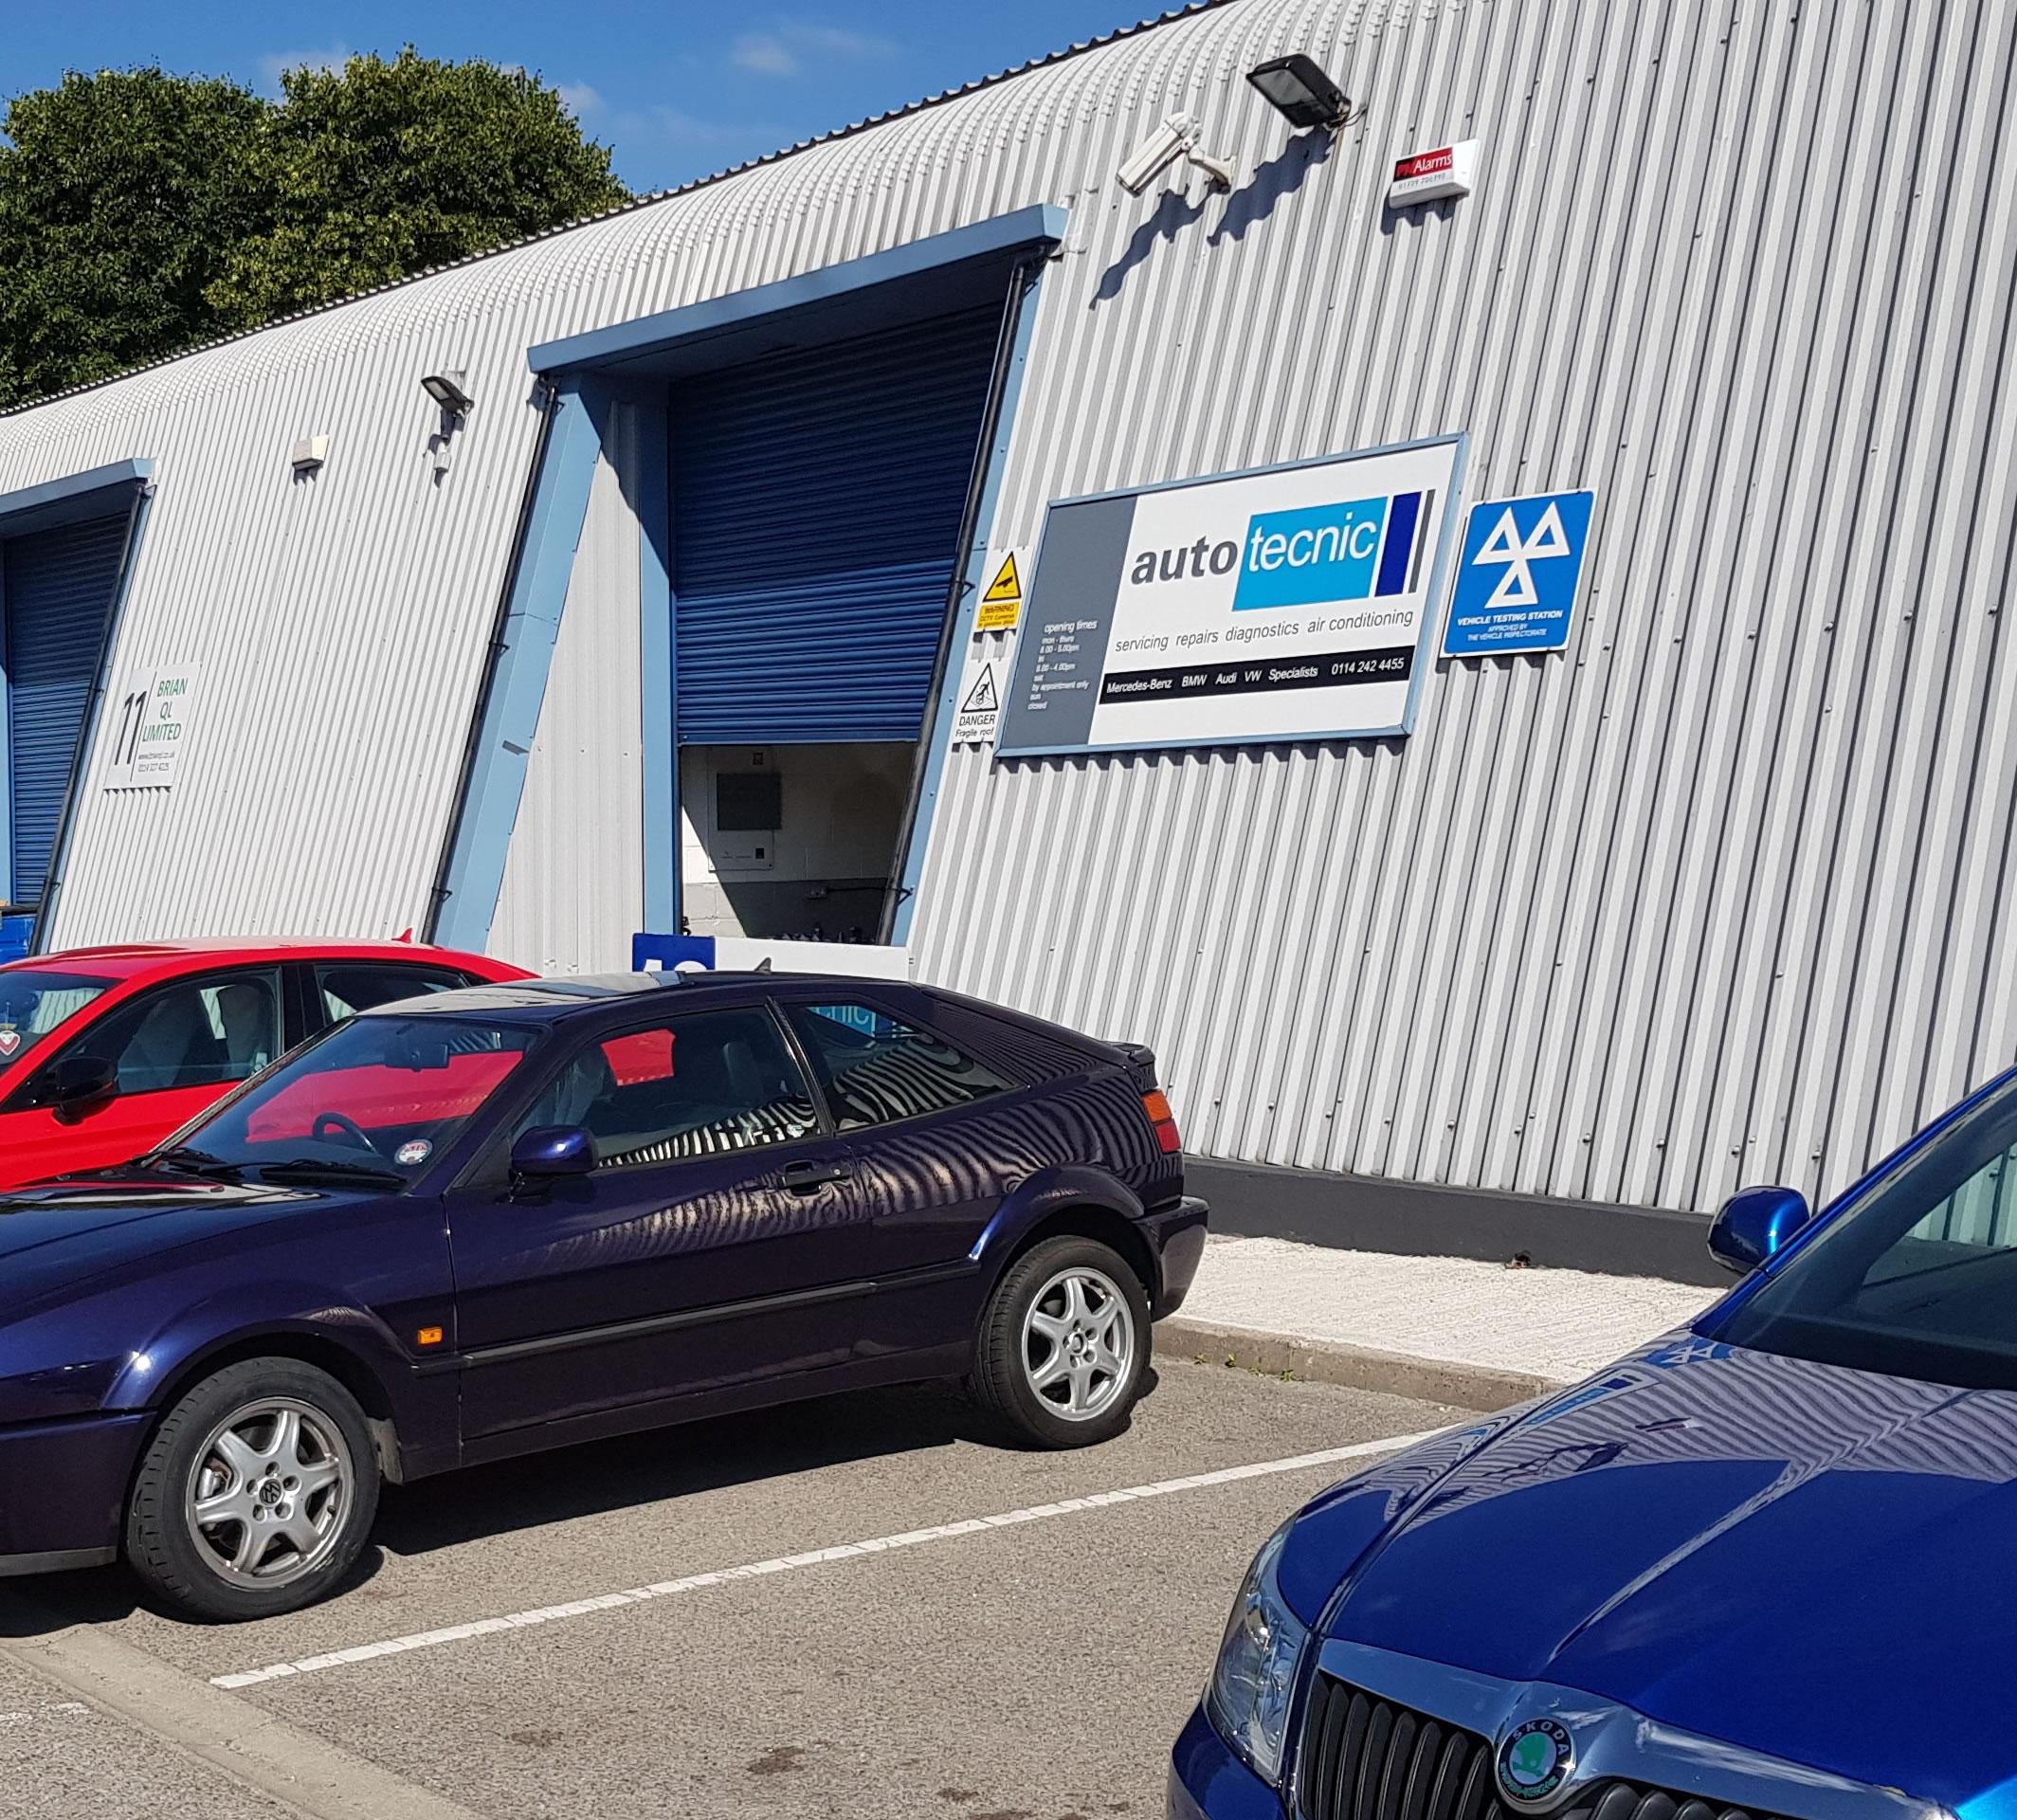 autotecnic-garage-outside